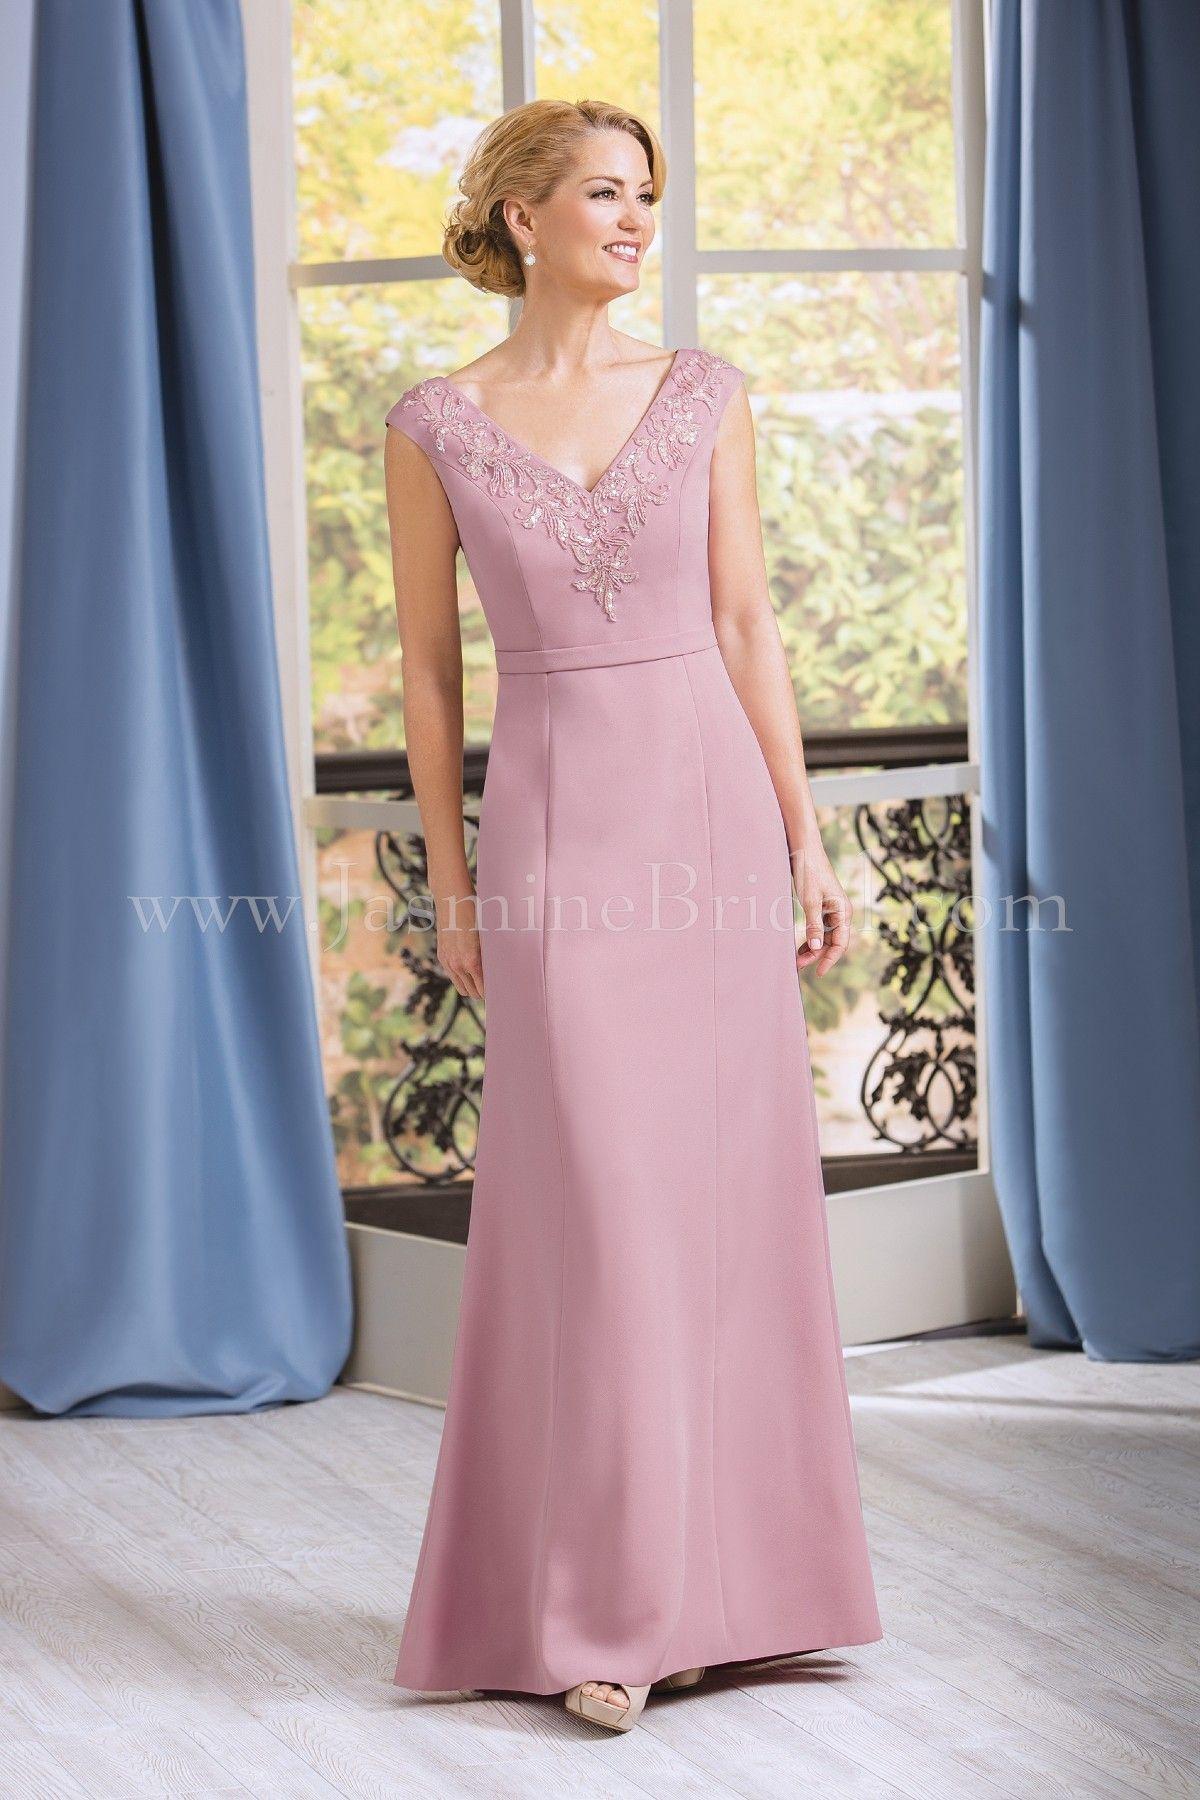 2803addd93c Jasmine Bridal Jade Style J185063 in Rose Petal